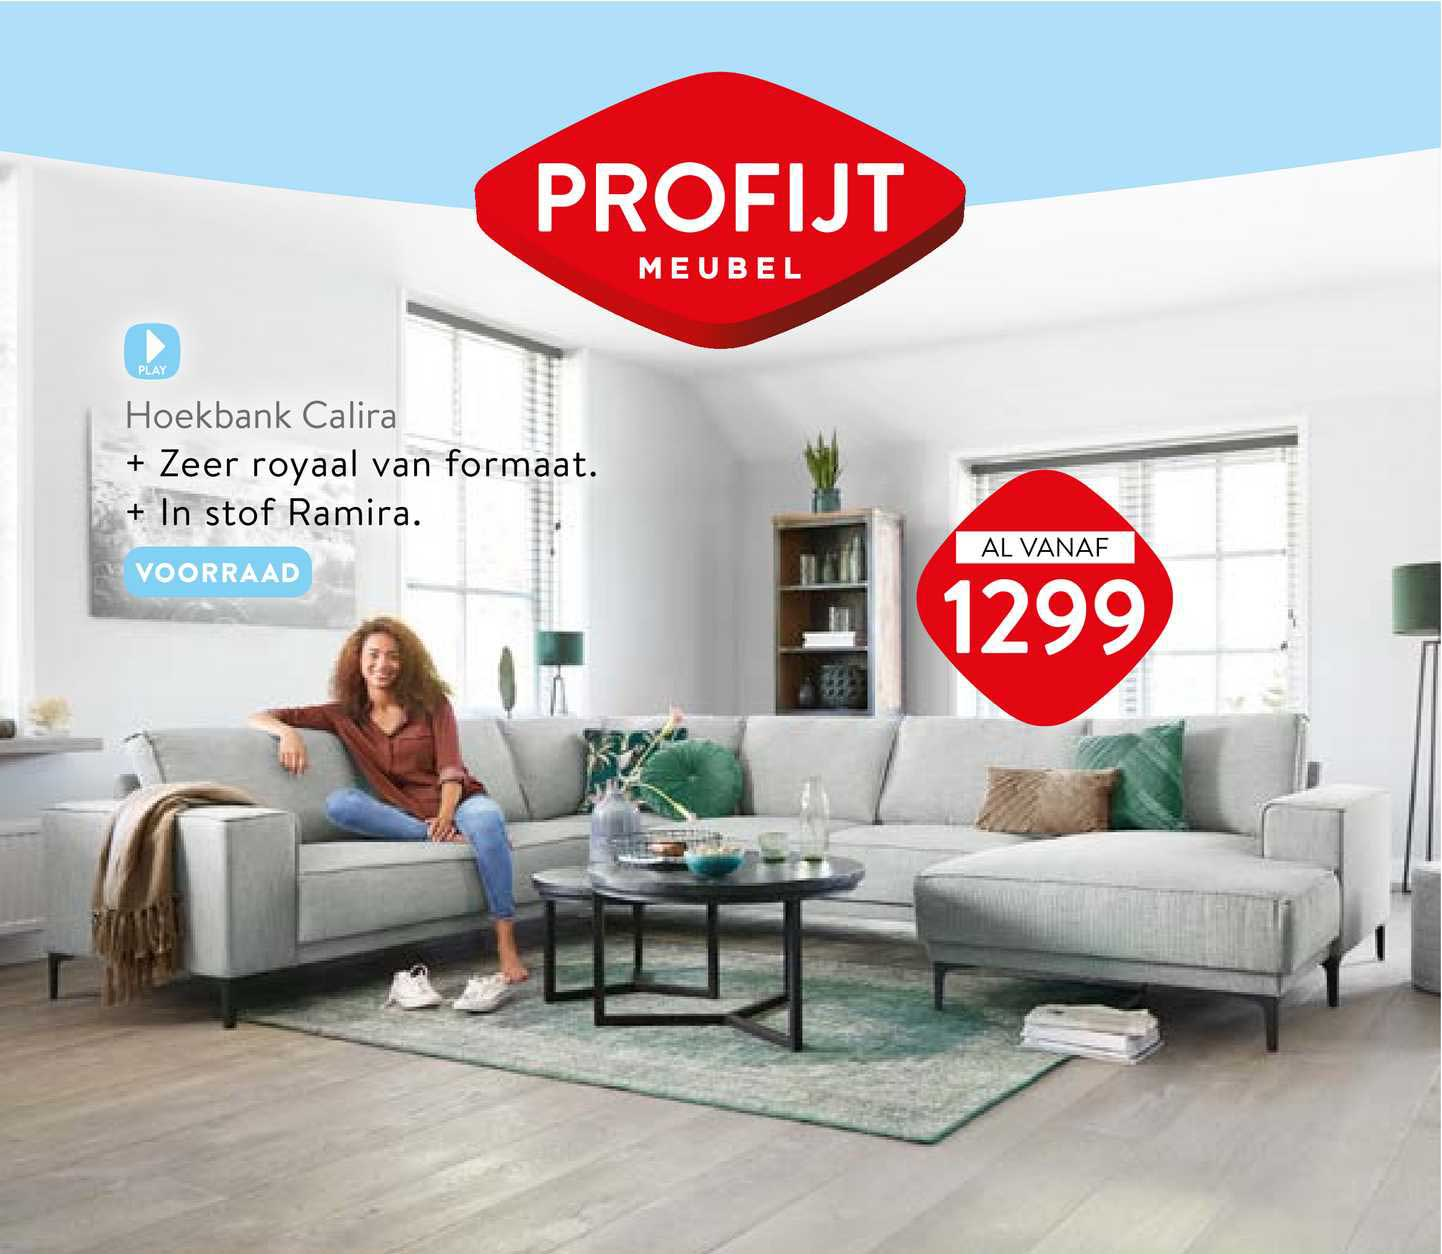 Profijt Meubel Hoekbank Calira